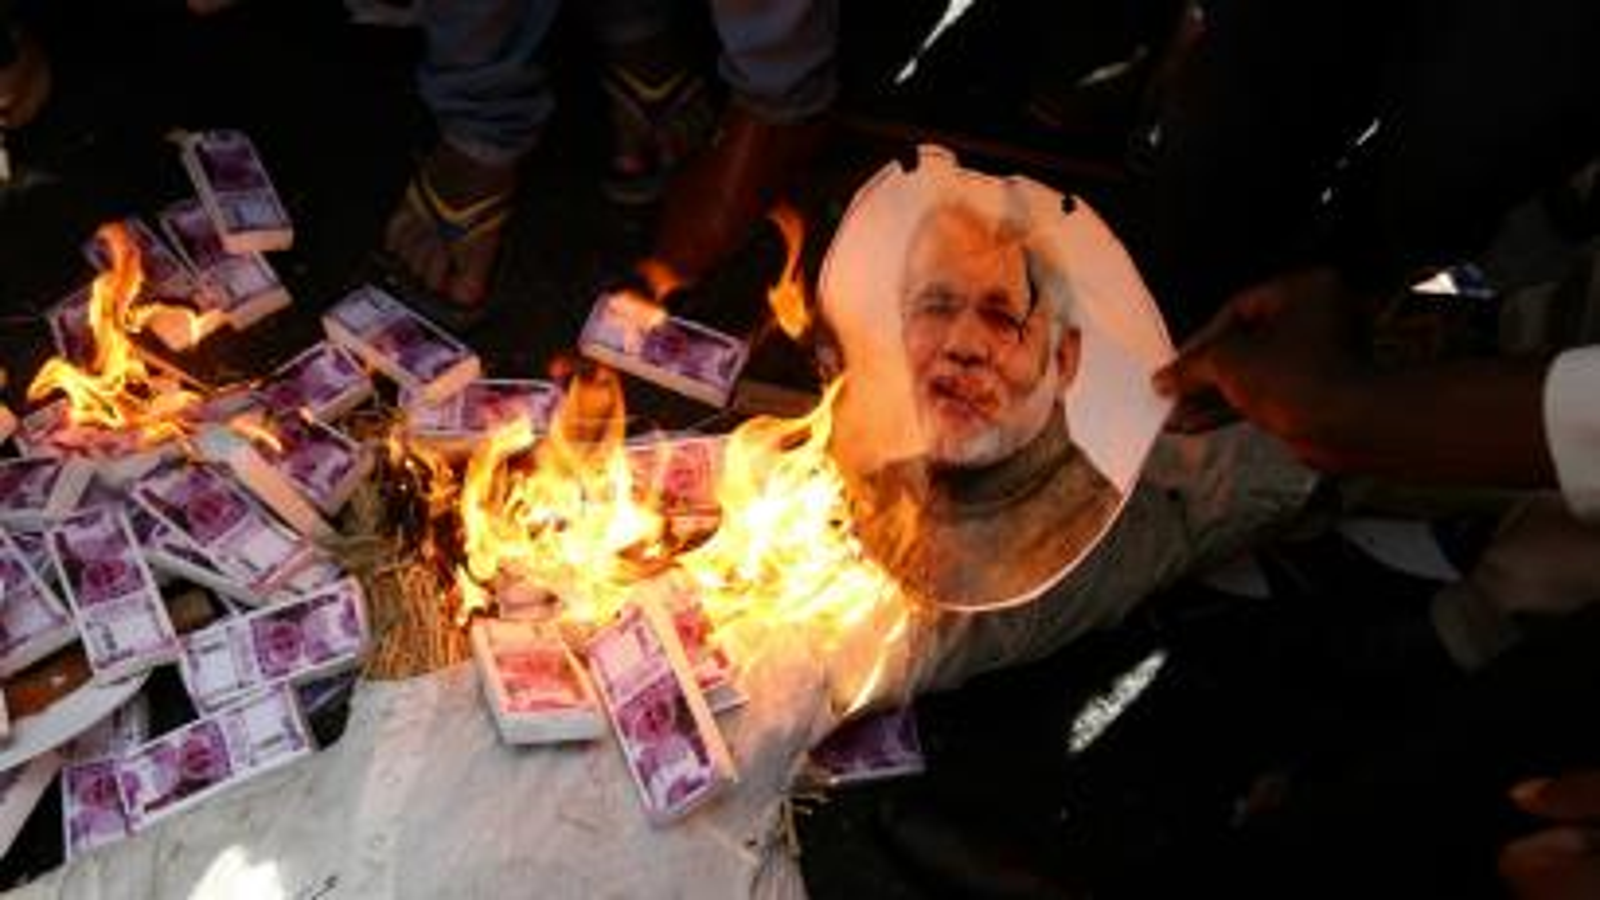 India-Narendra Modi-Demonetisation-Cash-Banks-Reserve Bank of India